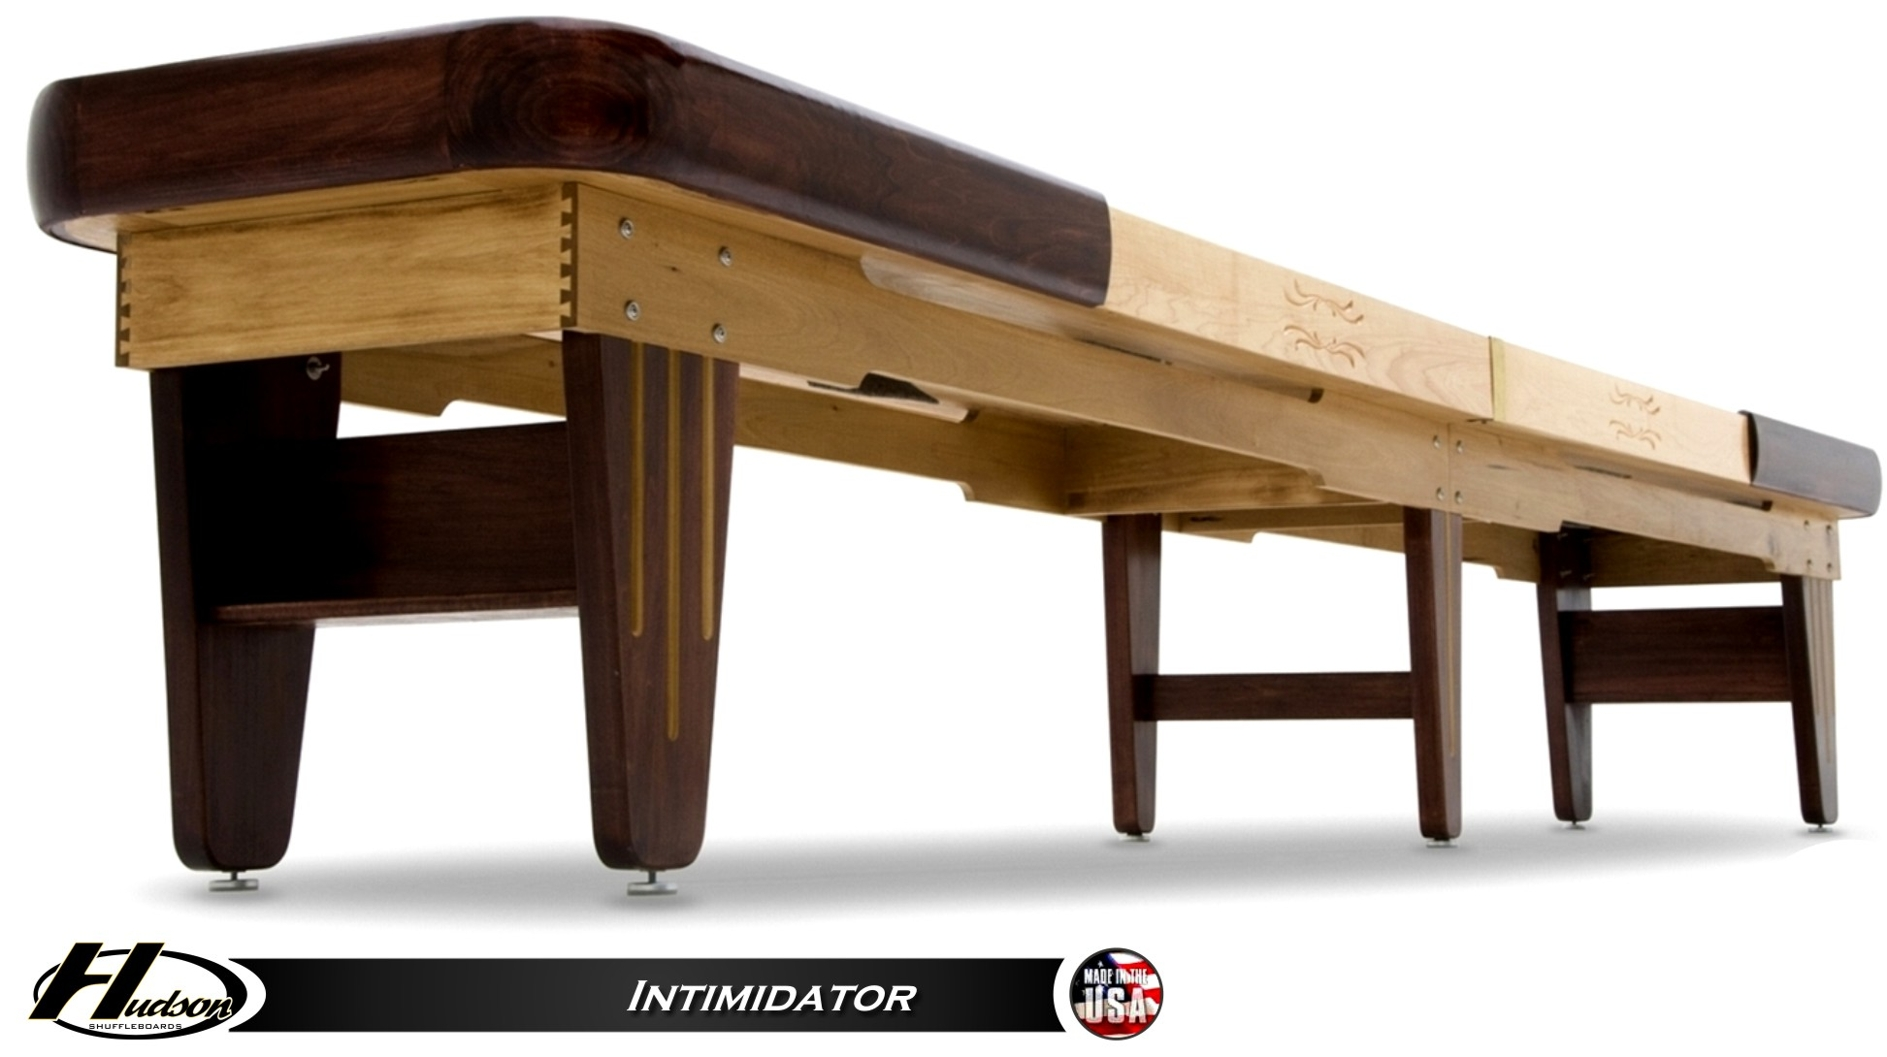 12 39 intimidator shuffleboard table for 12 foot shuffleboard table dimensions